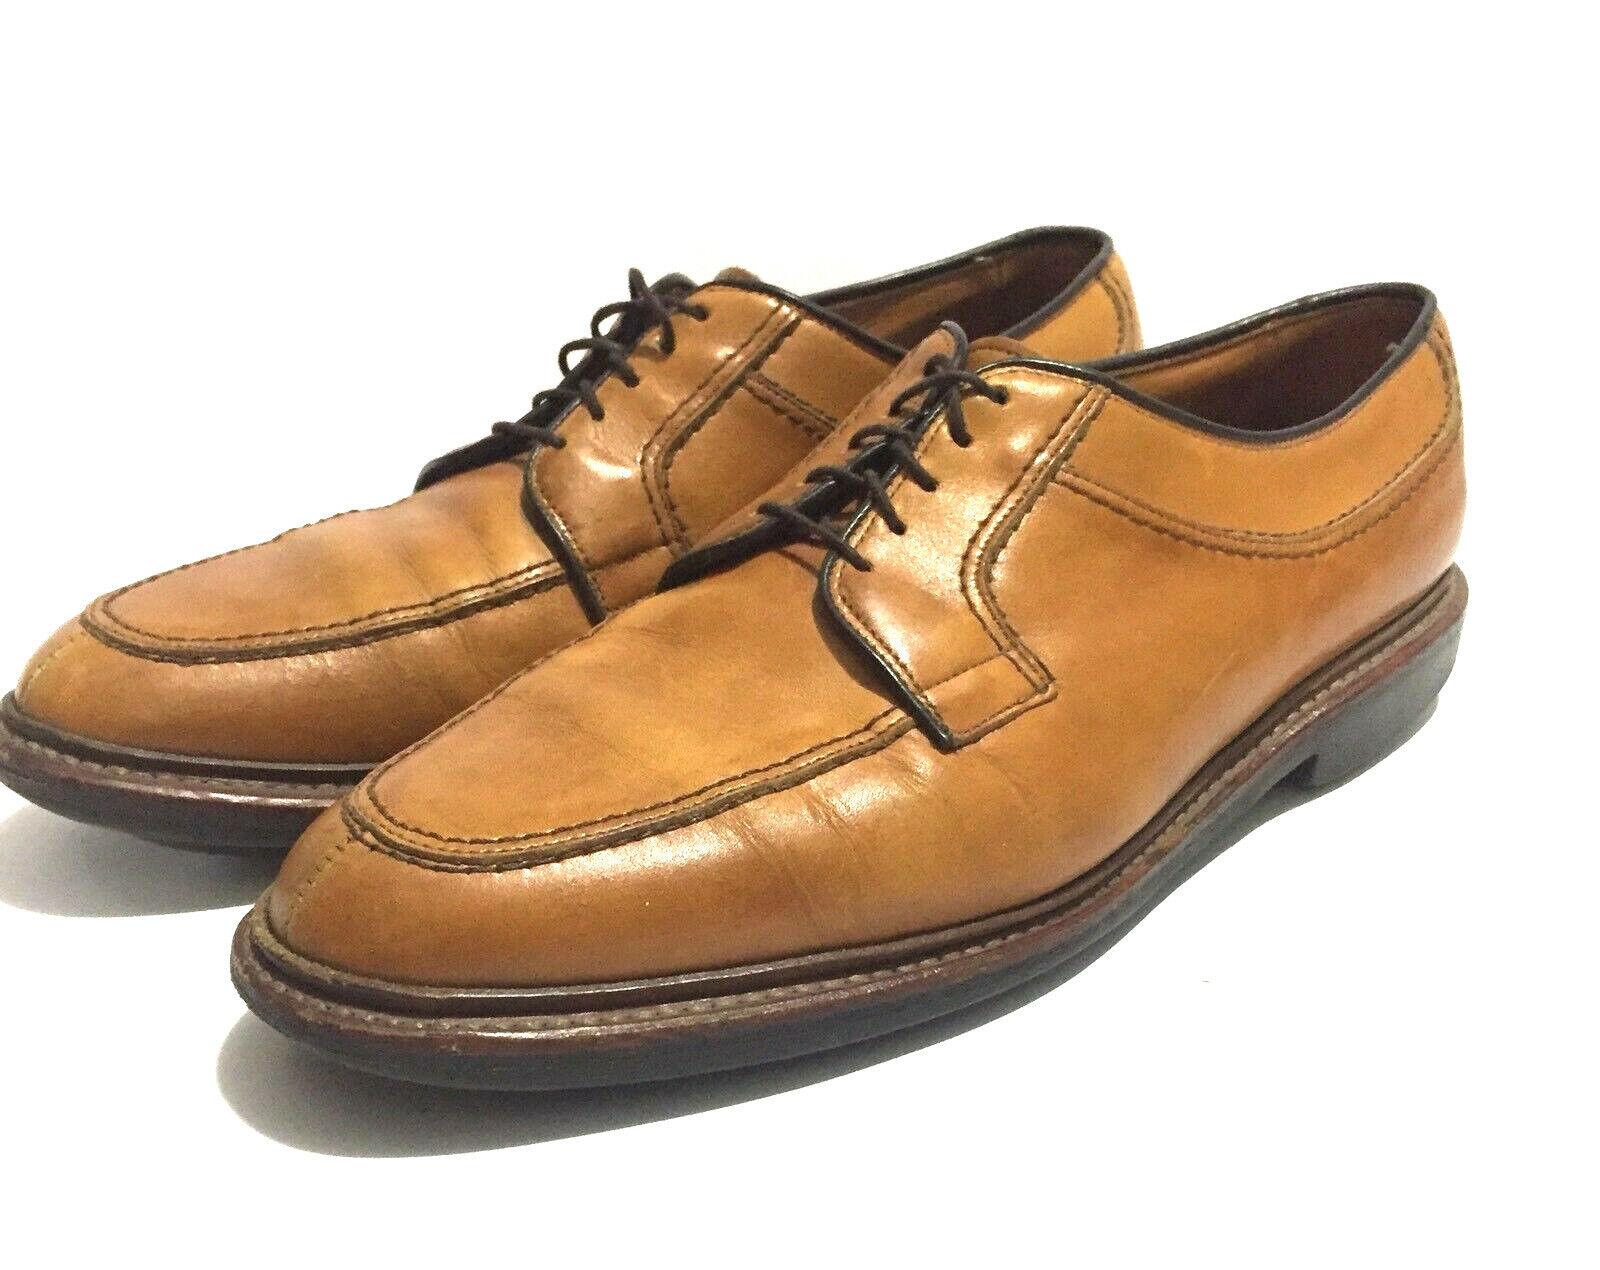 ALLEN EDMONDS Norse Walnut Brown Leather Split Toe Derby Oxford shoes USA- 9.5 D